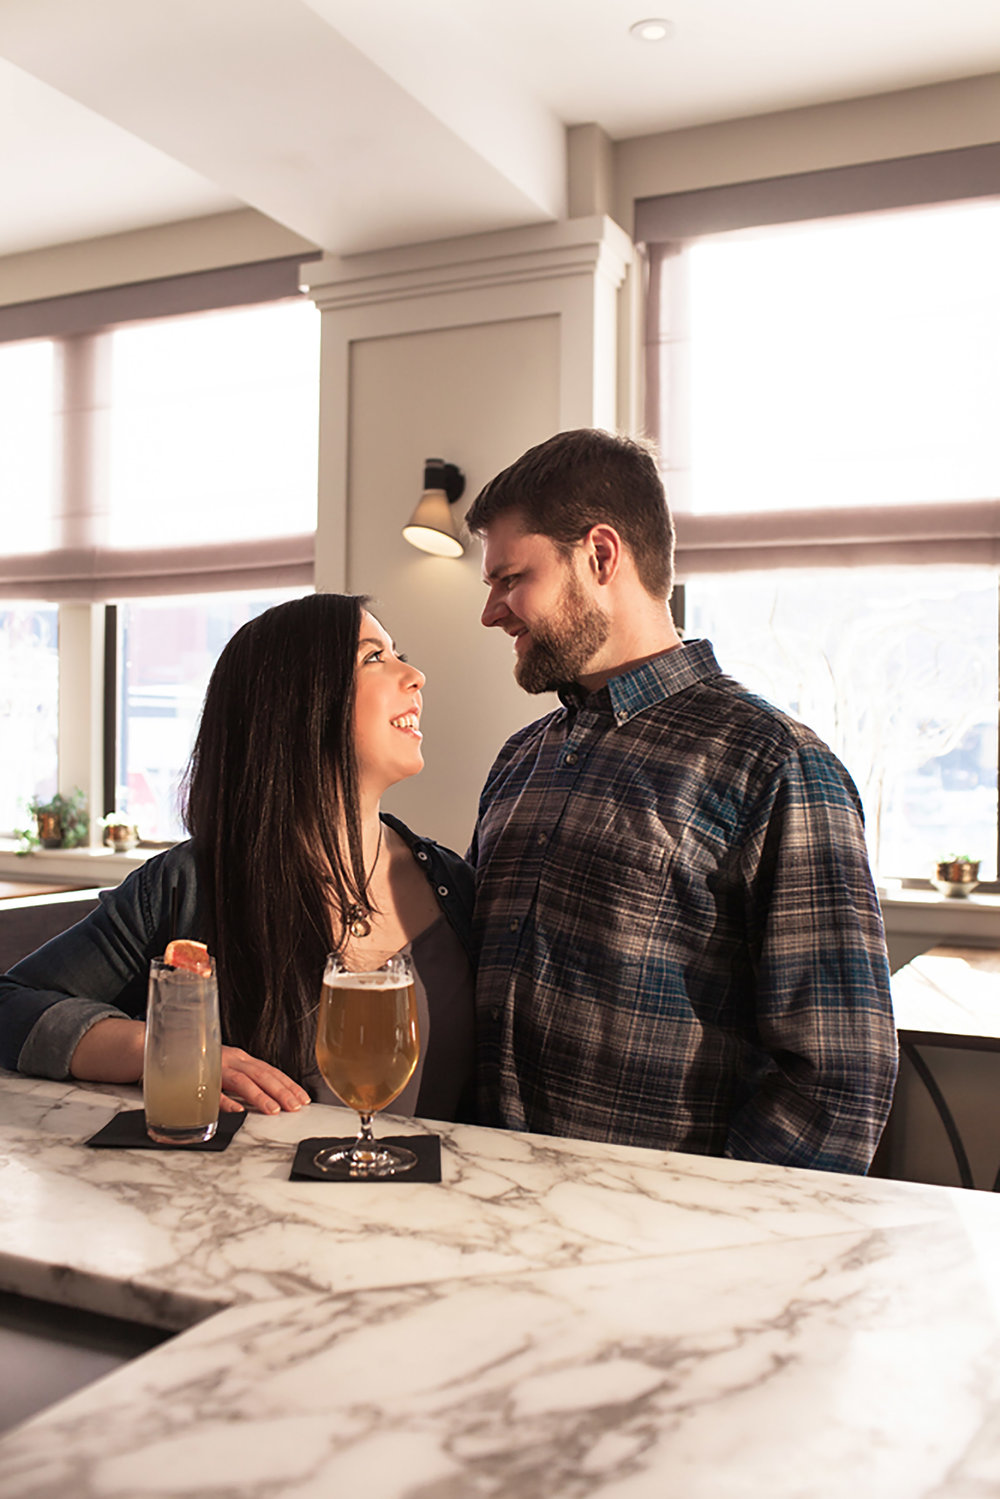 005© Heidi Kirn Press Hotel Portand Maine Engagement Photos .jpg